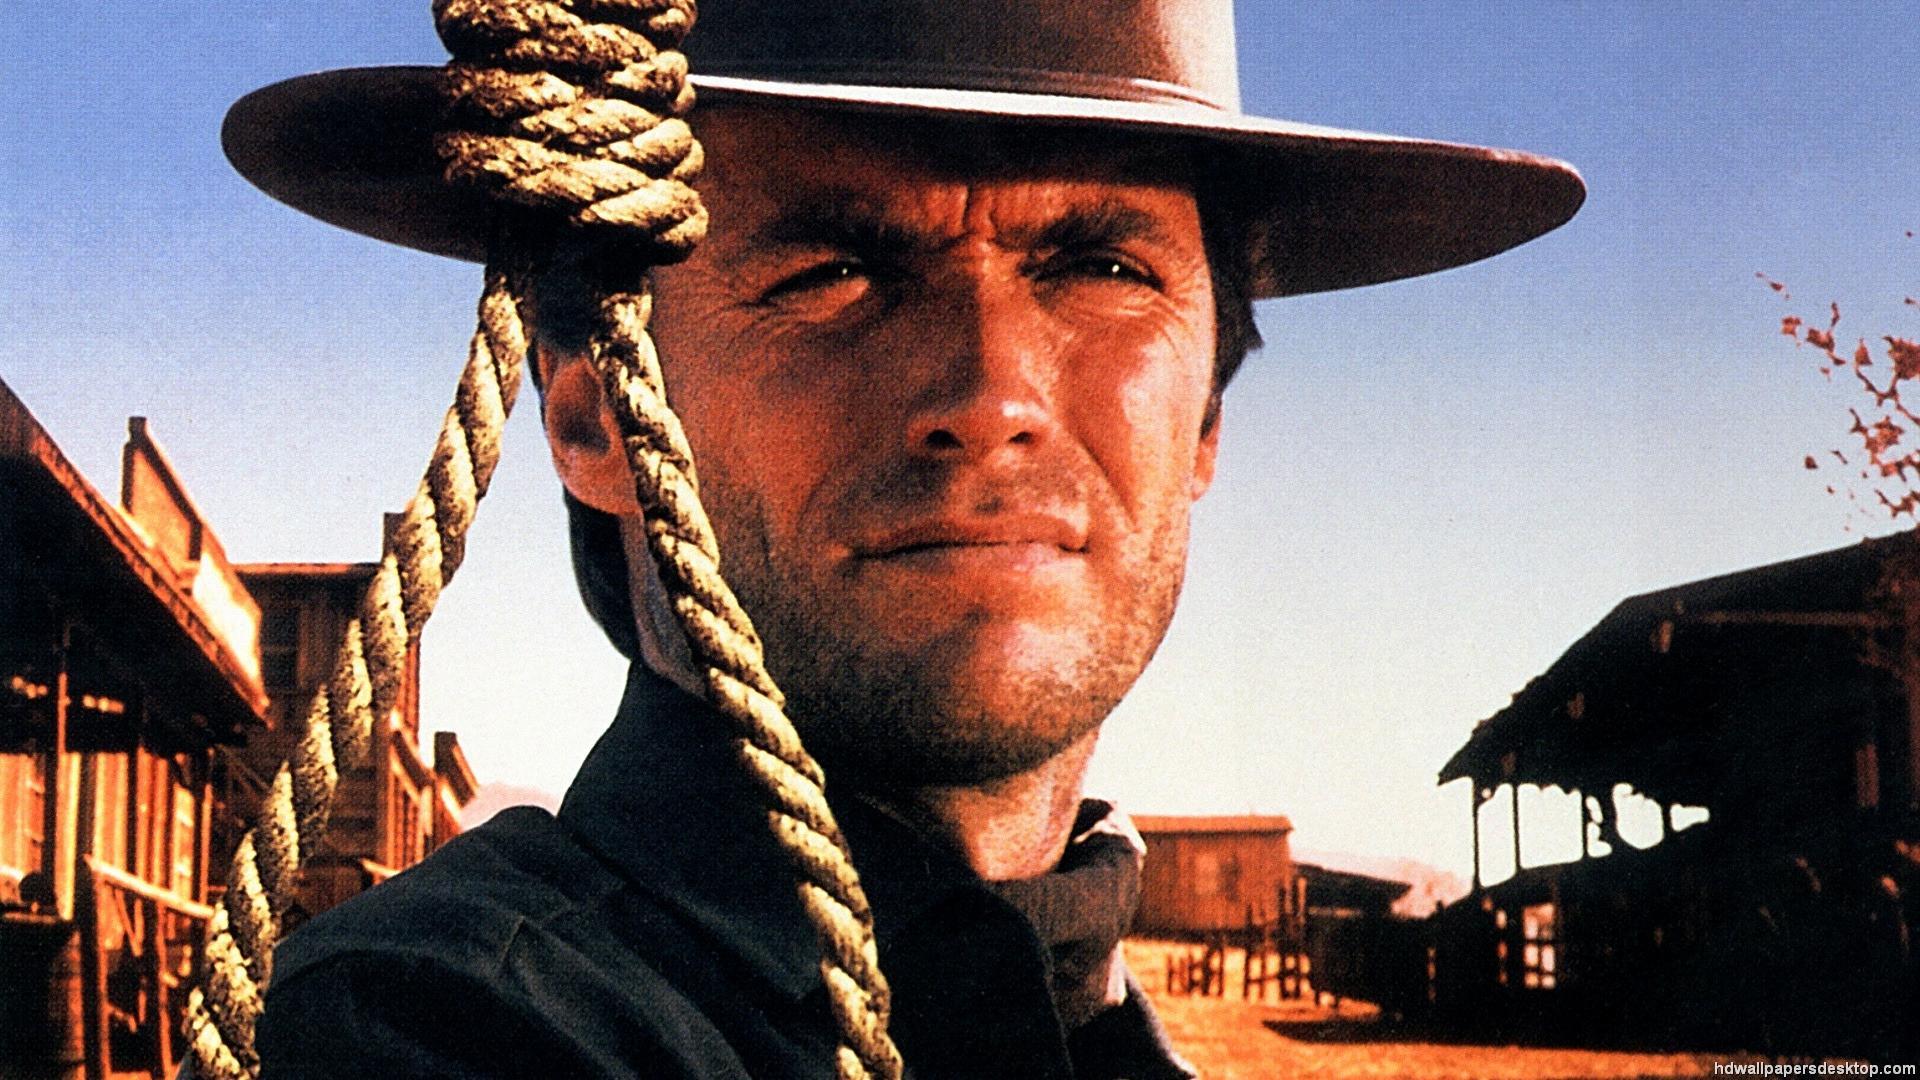 Clint Eastwood Wallpaper 1920x1080 62078